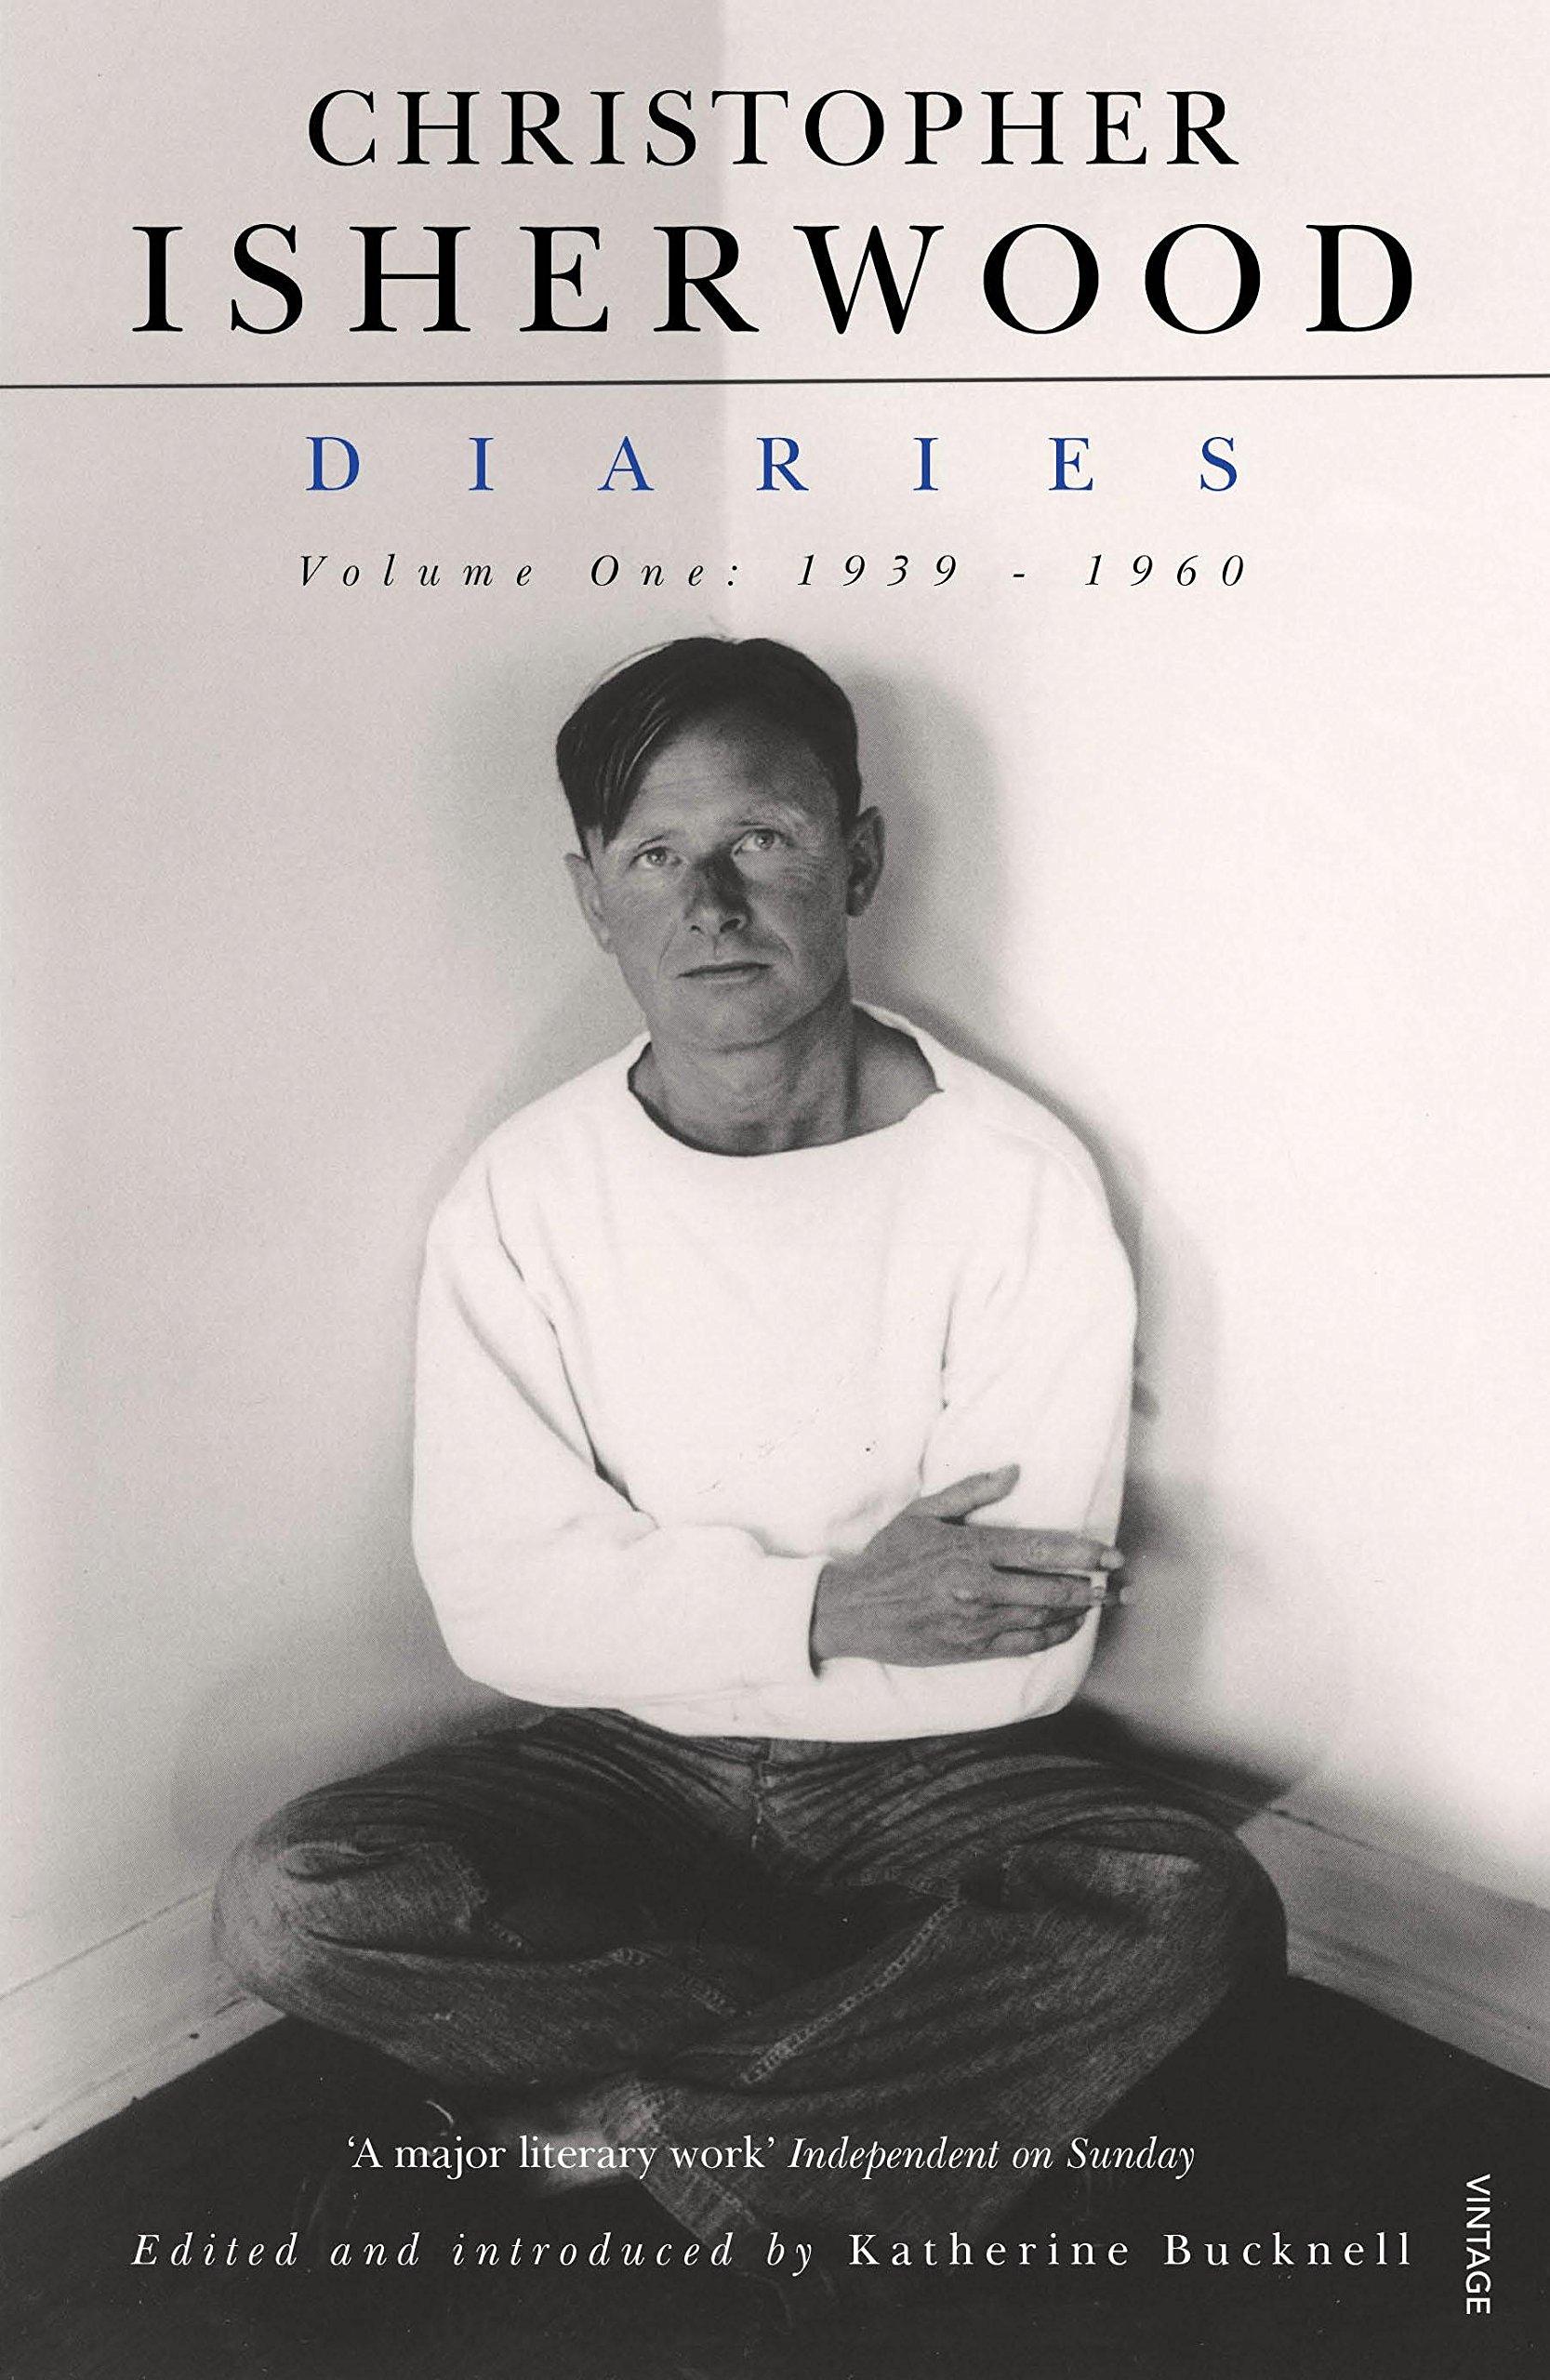 Christopher Isherwood Diaries Volume 1: Amazon.co.uk: Christopher  Isherwood: 9780099555827: Books